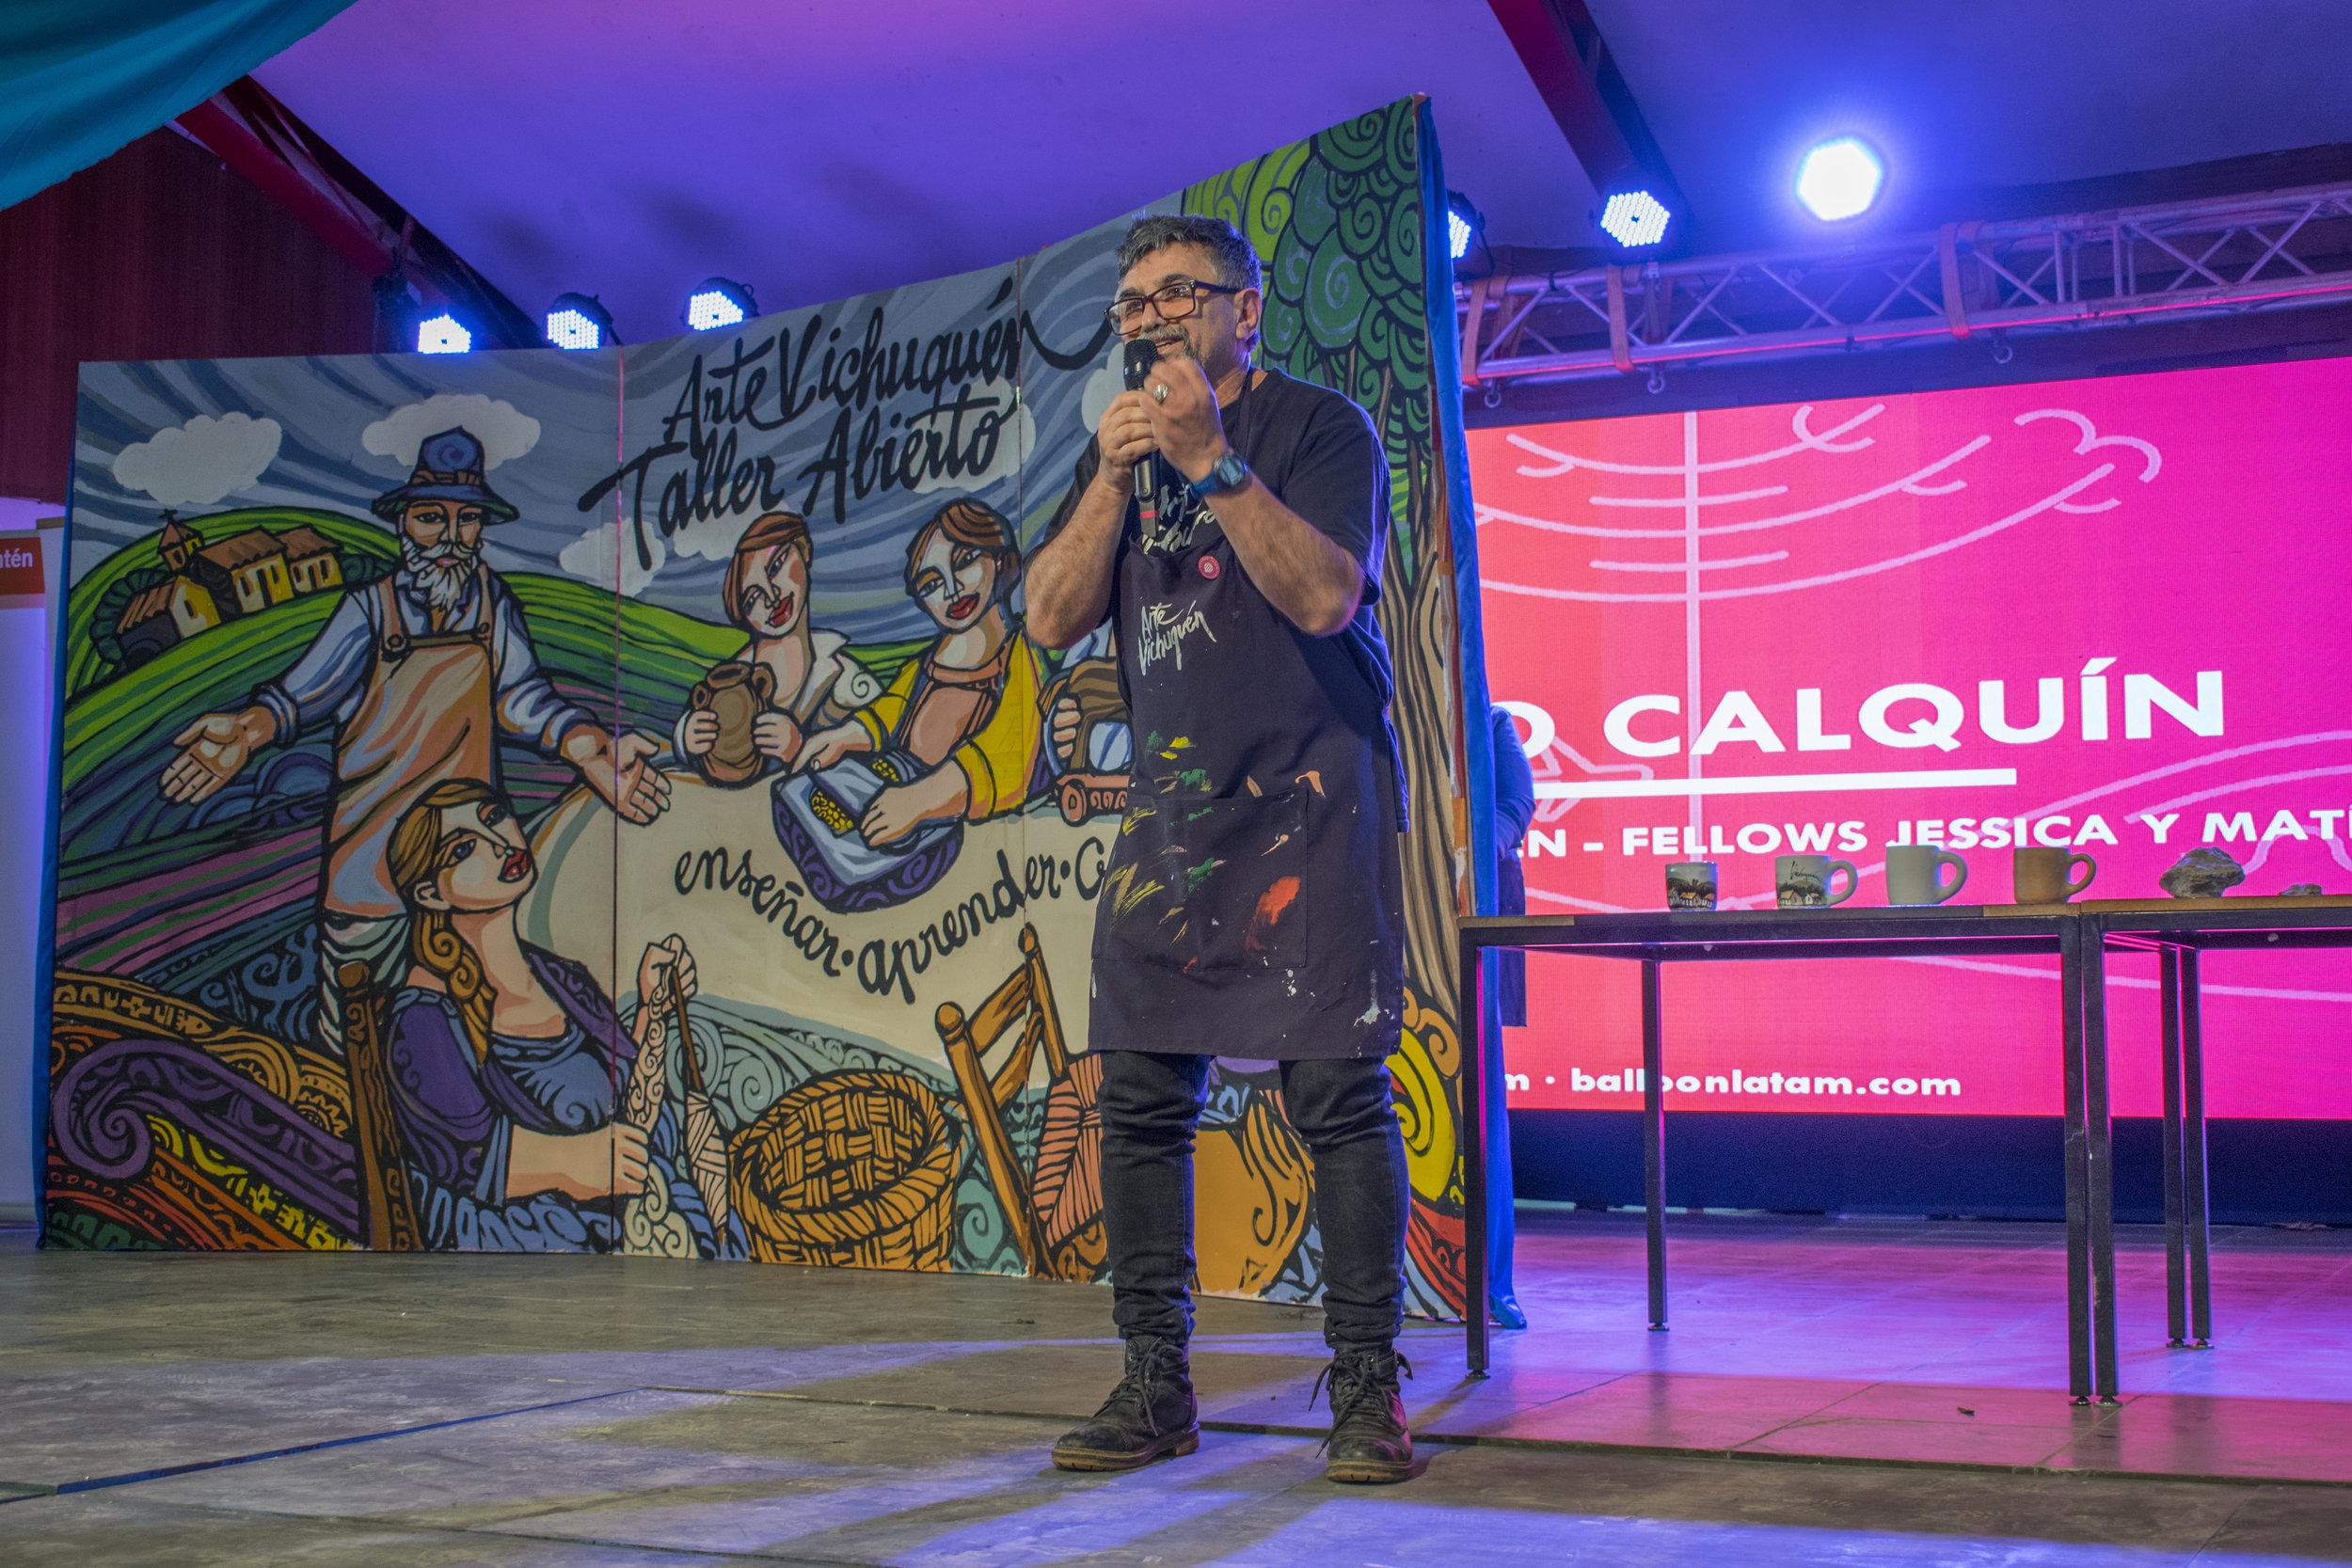 Roberto Calquín, Emprendedor Balloon reconocido con el 1er Lugar del Balloon Internacional 2019.